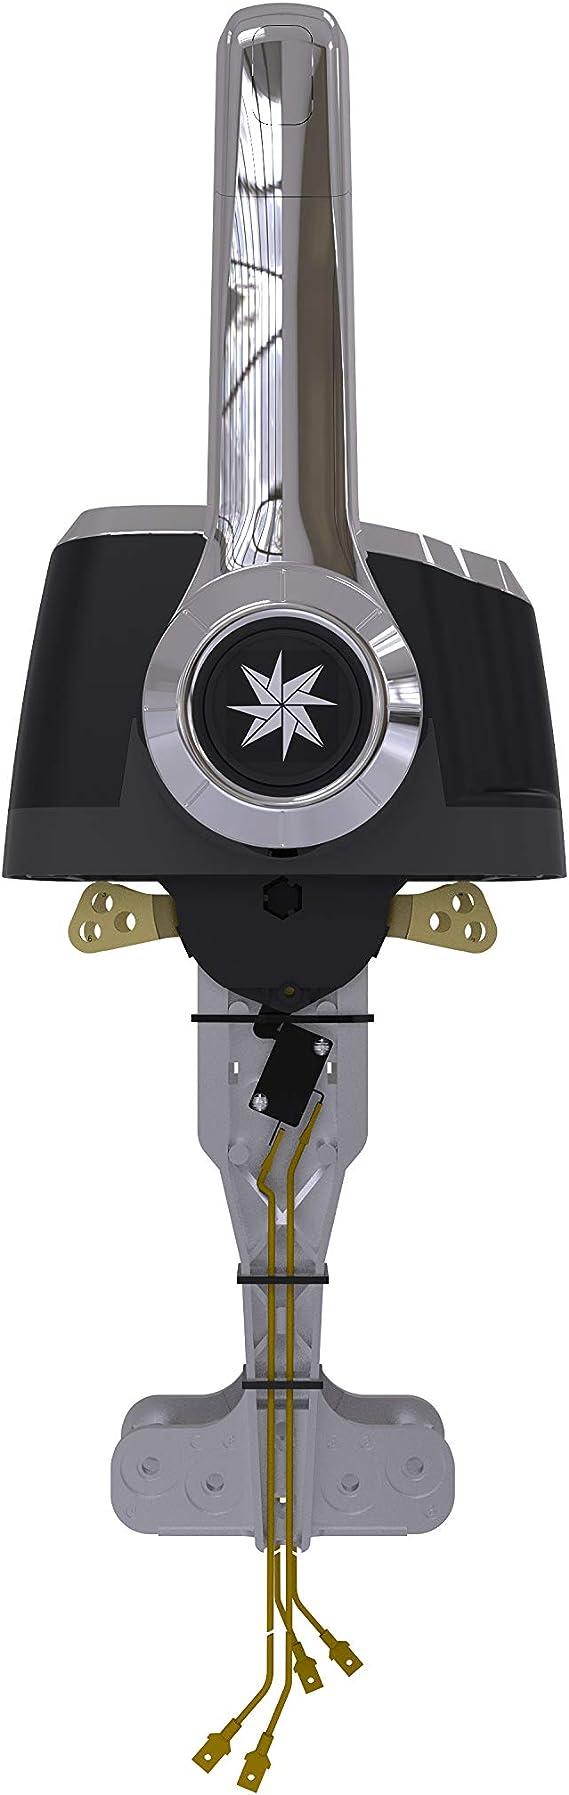 Dometic SeaStar Xtreme Control Chrome CHX8240P Dual Top Mount